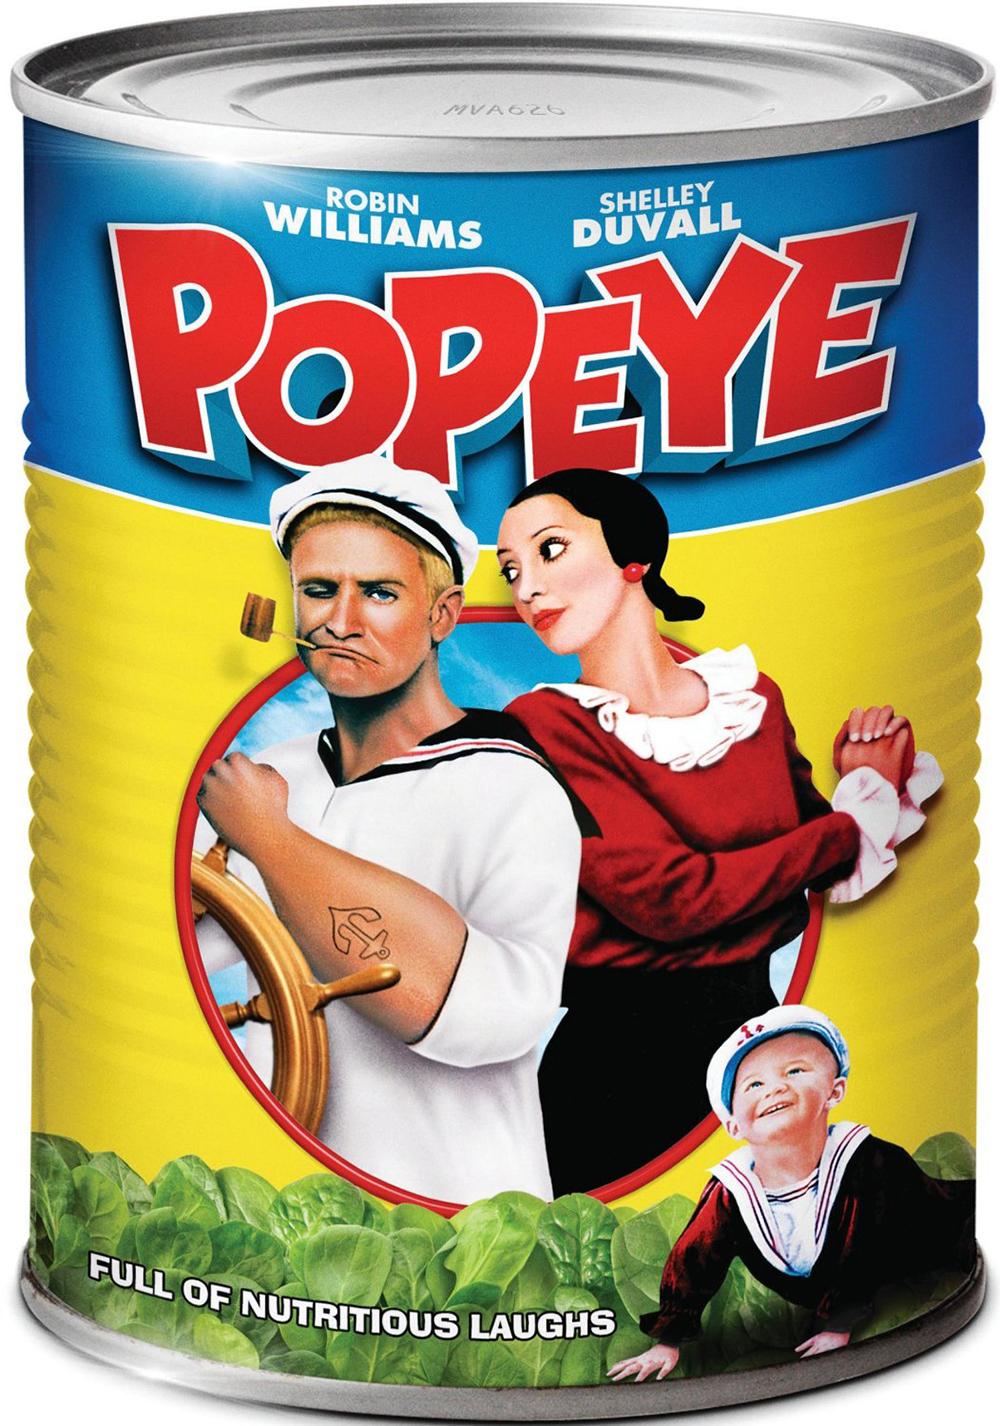 Robin Williams Memorial Screening Popeye Nyc Area